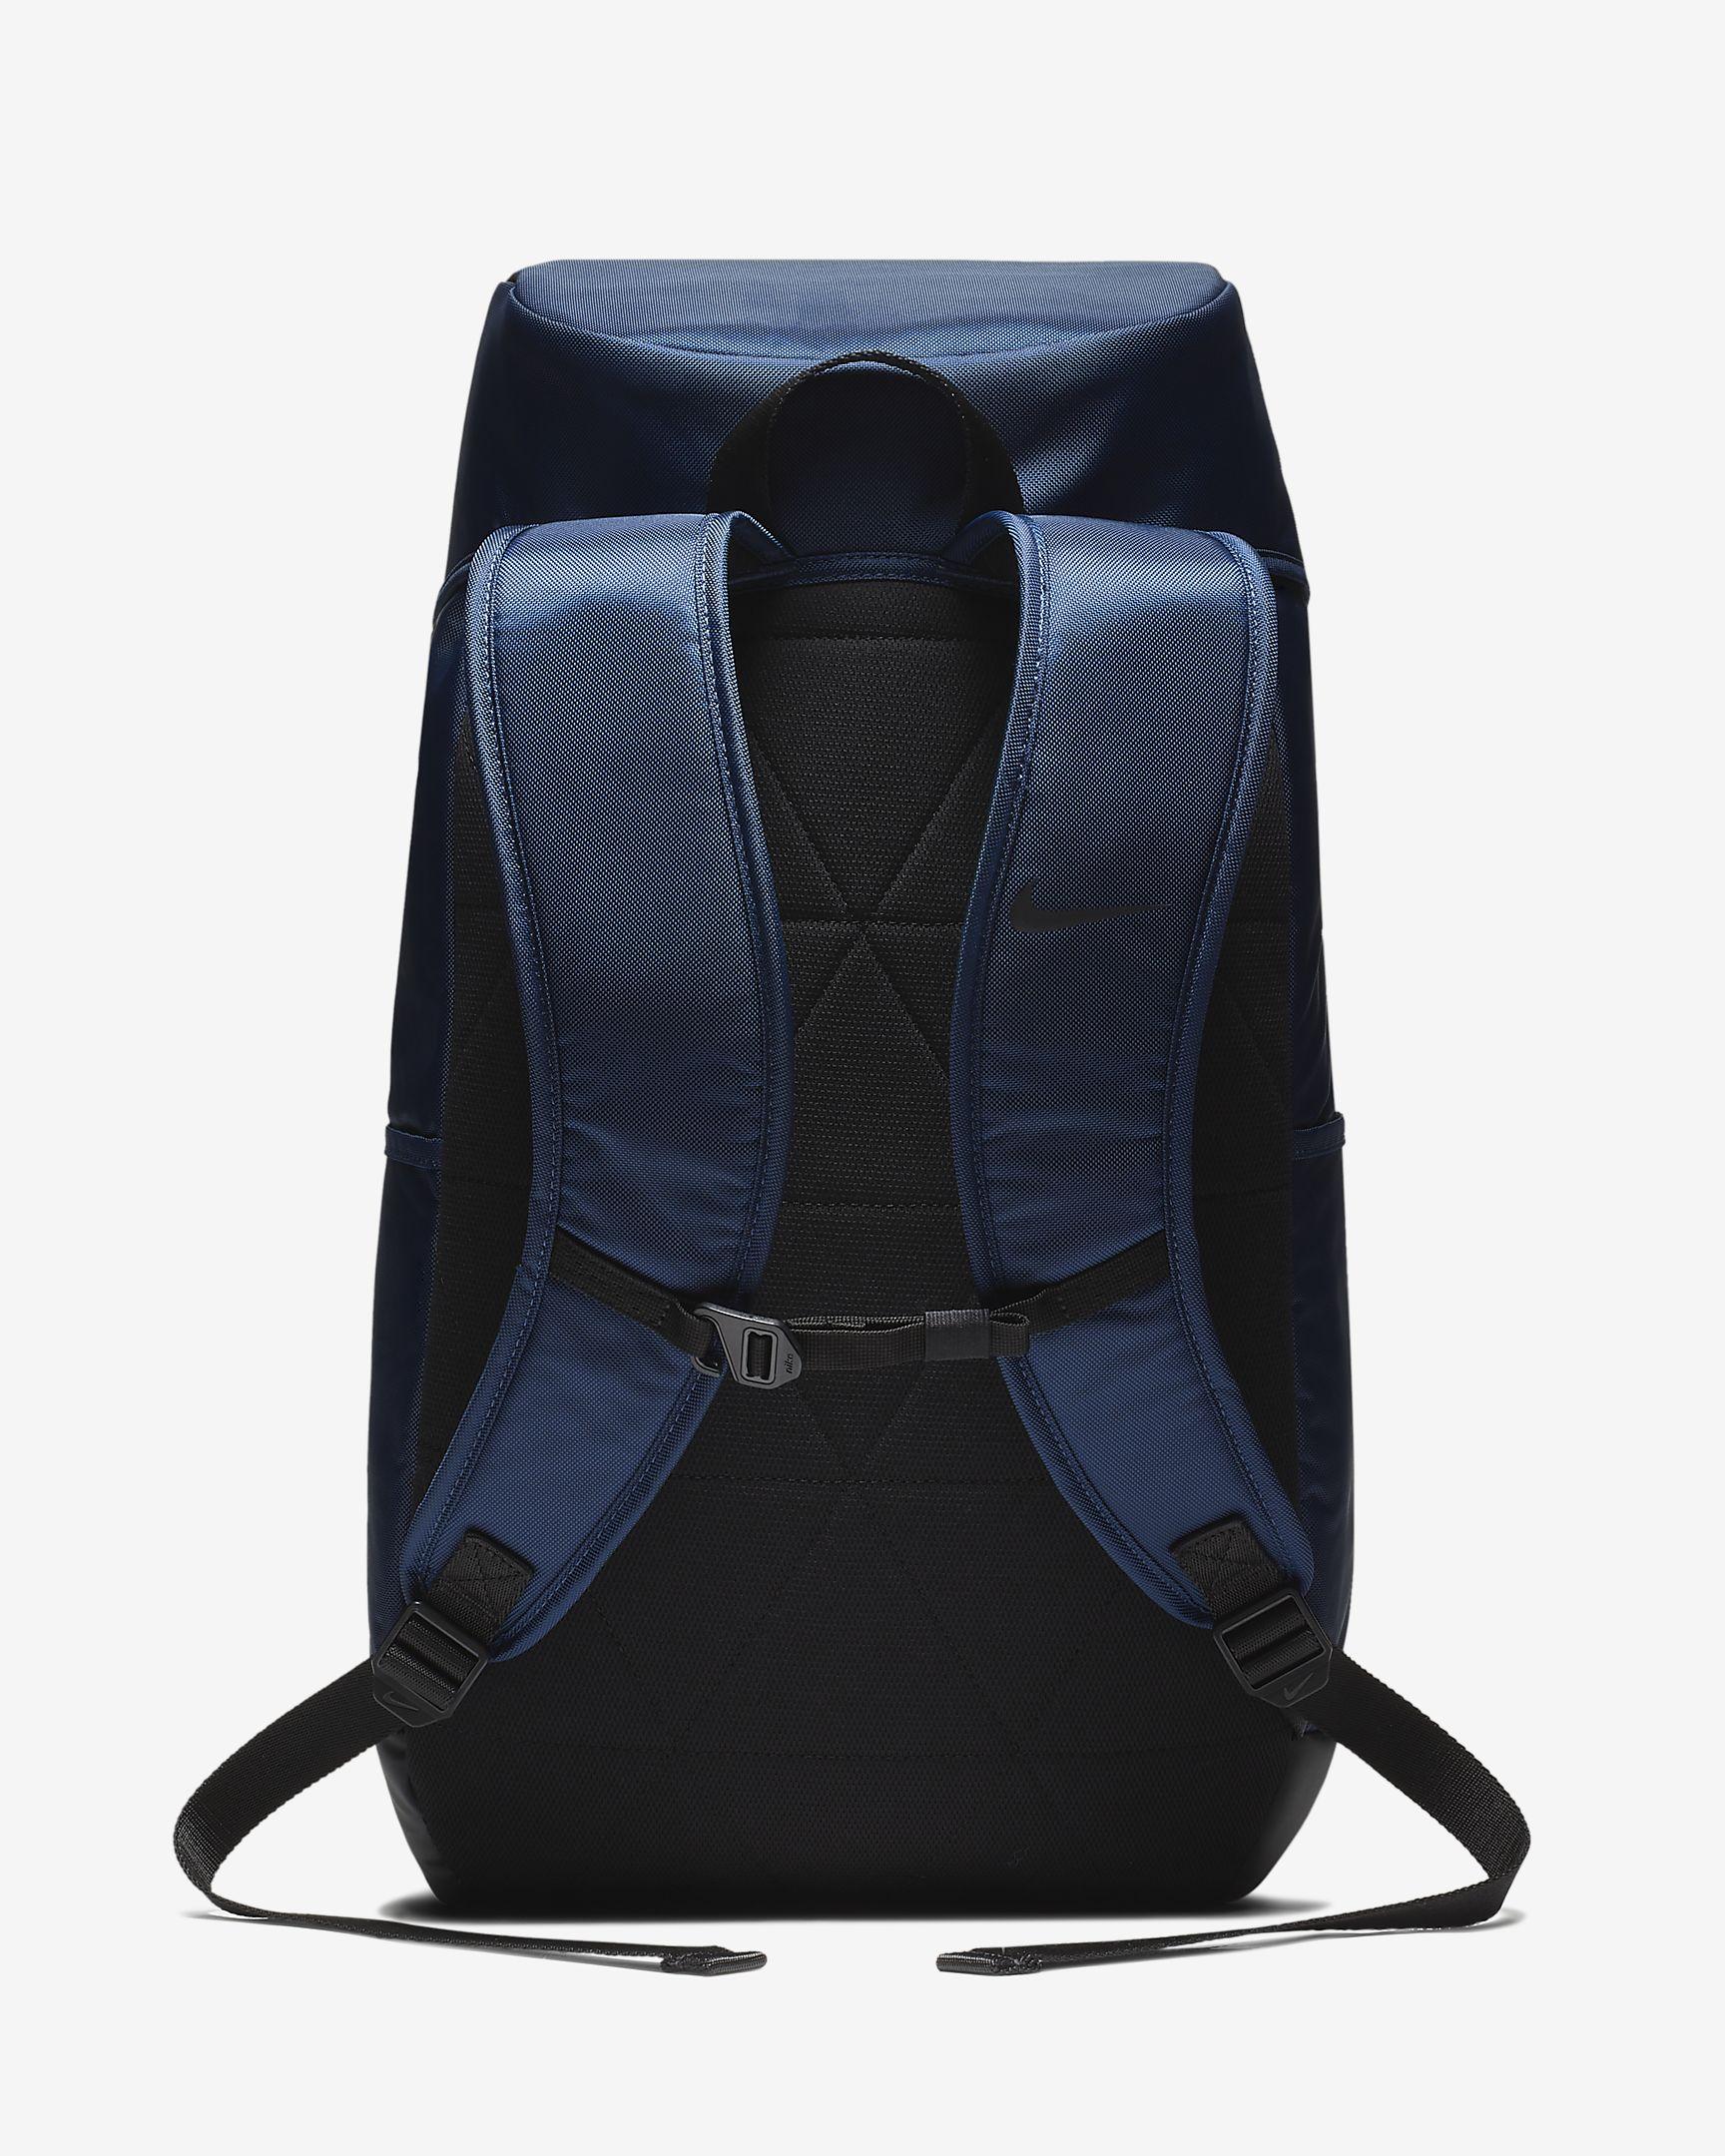 Nike Vapor Speed 2.0 Training Backpack - SPORTING GOODS Backpacks ... 83c15acc3b